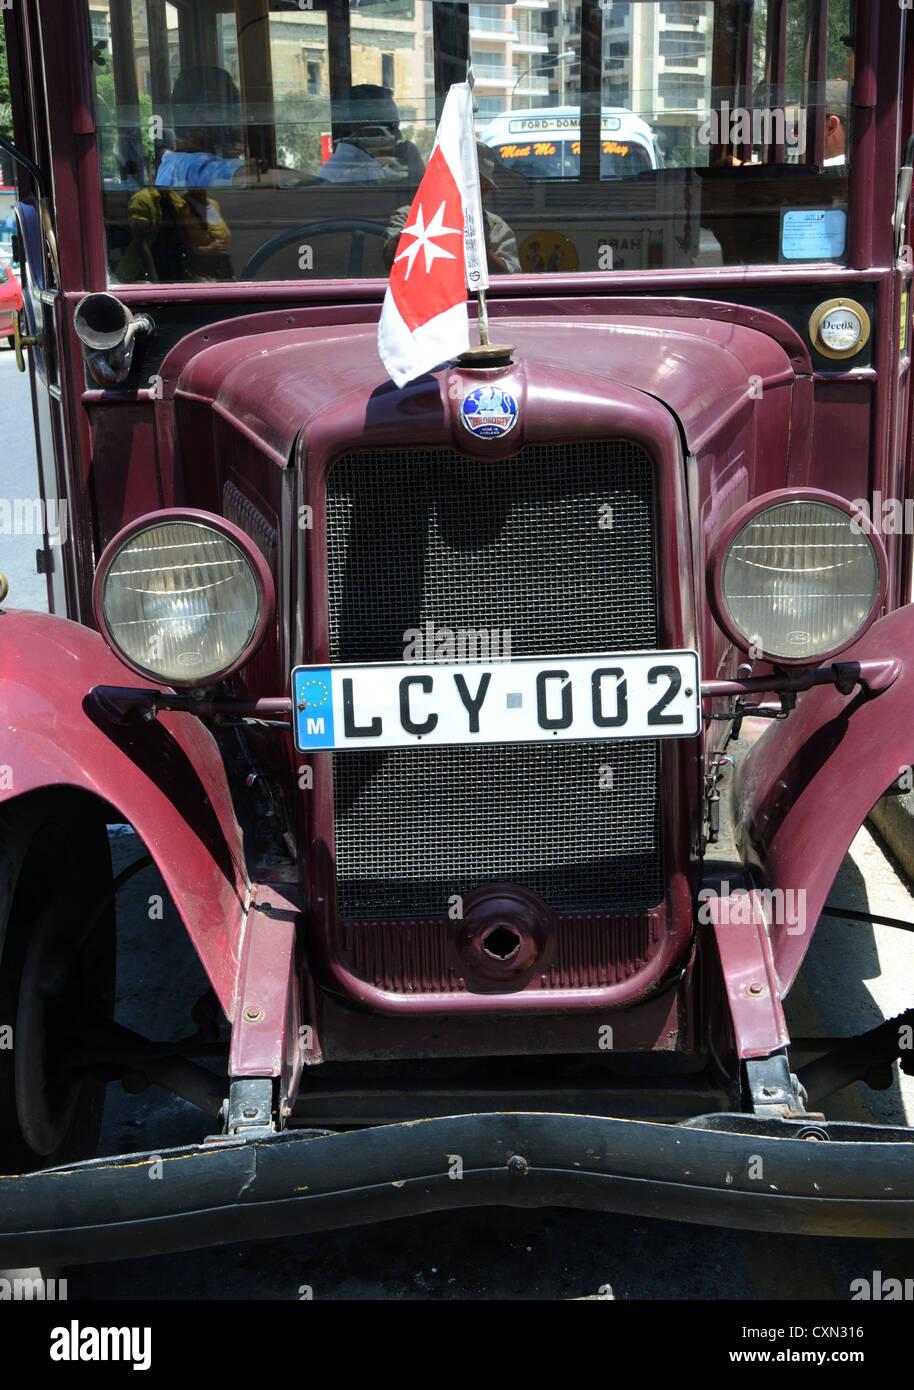 Vintage bus Maltese flag front view Bedford headlamps radiator - Stock Image